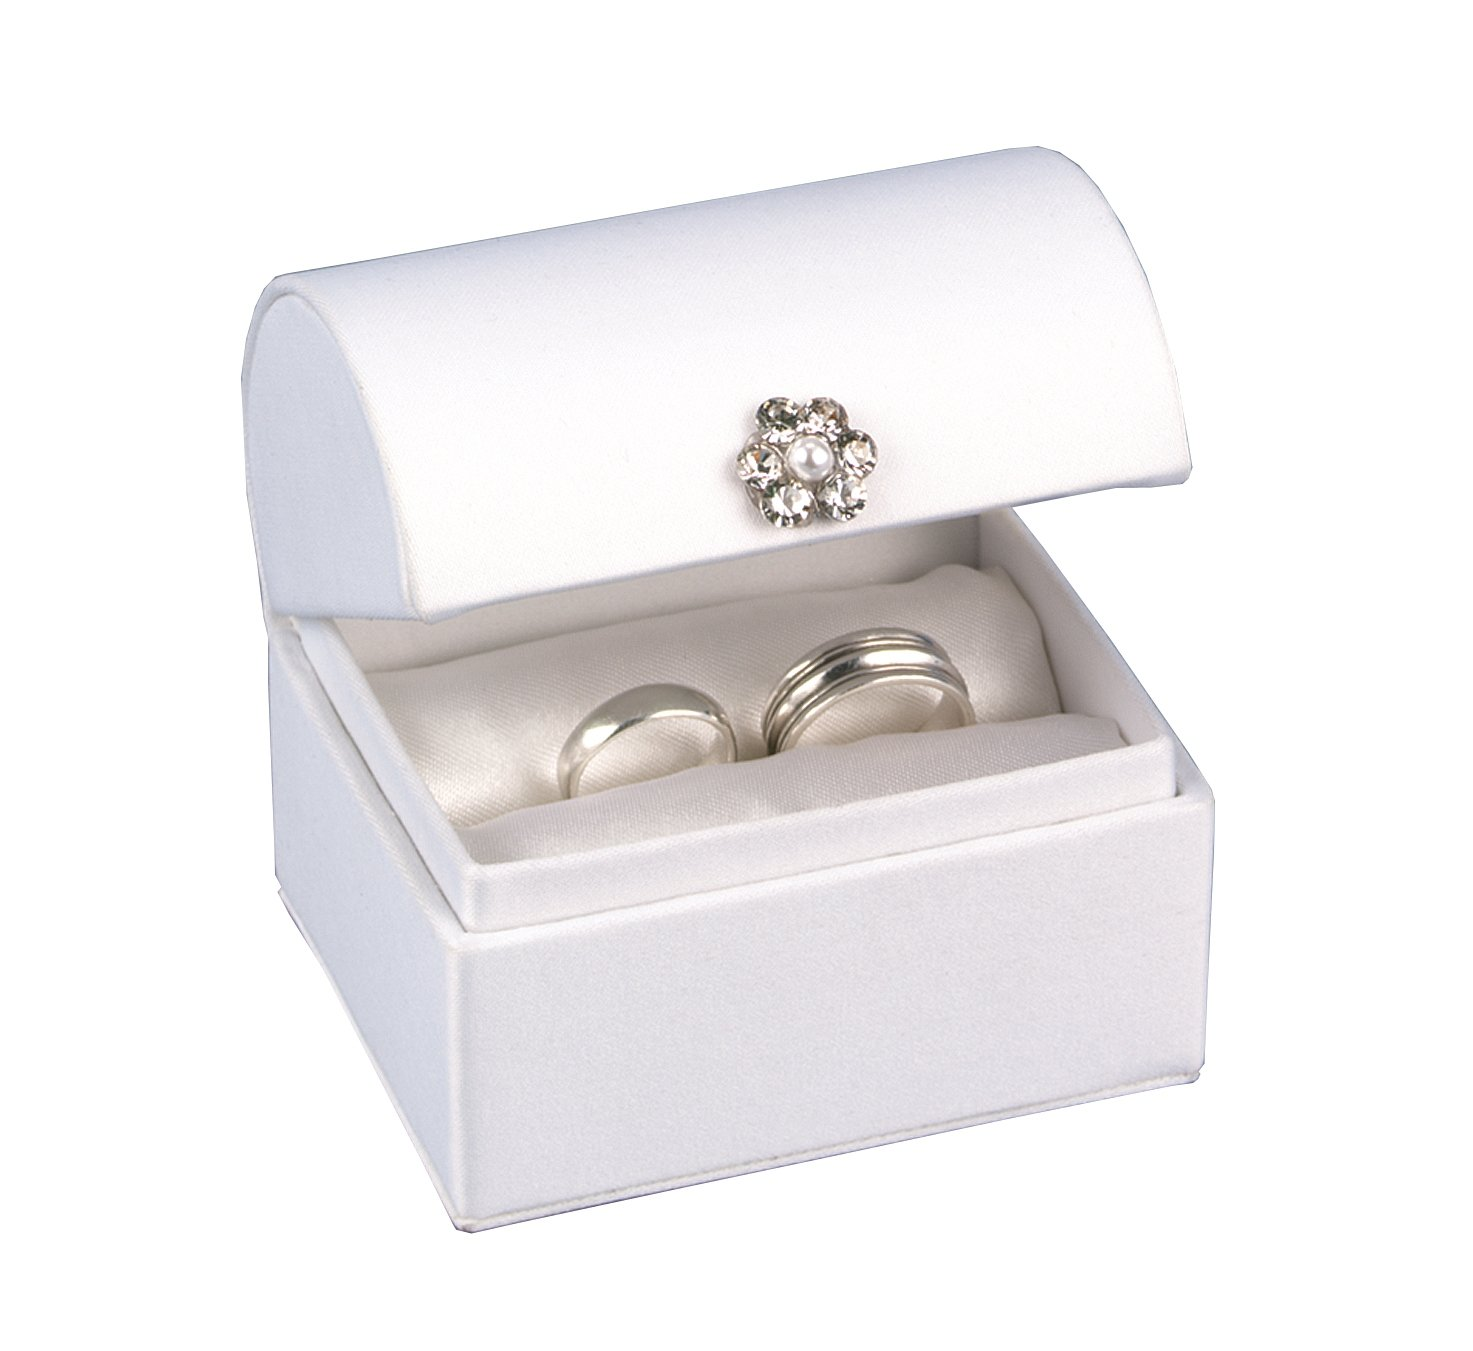 Hortense B. Hewitt Wedding Accessories White Satin Treasure Chest Ring Box – Decorative Boxes